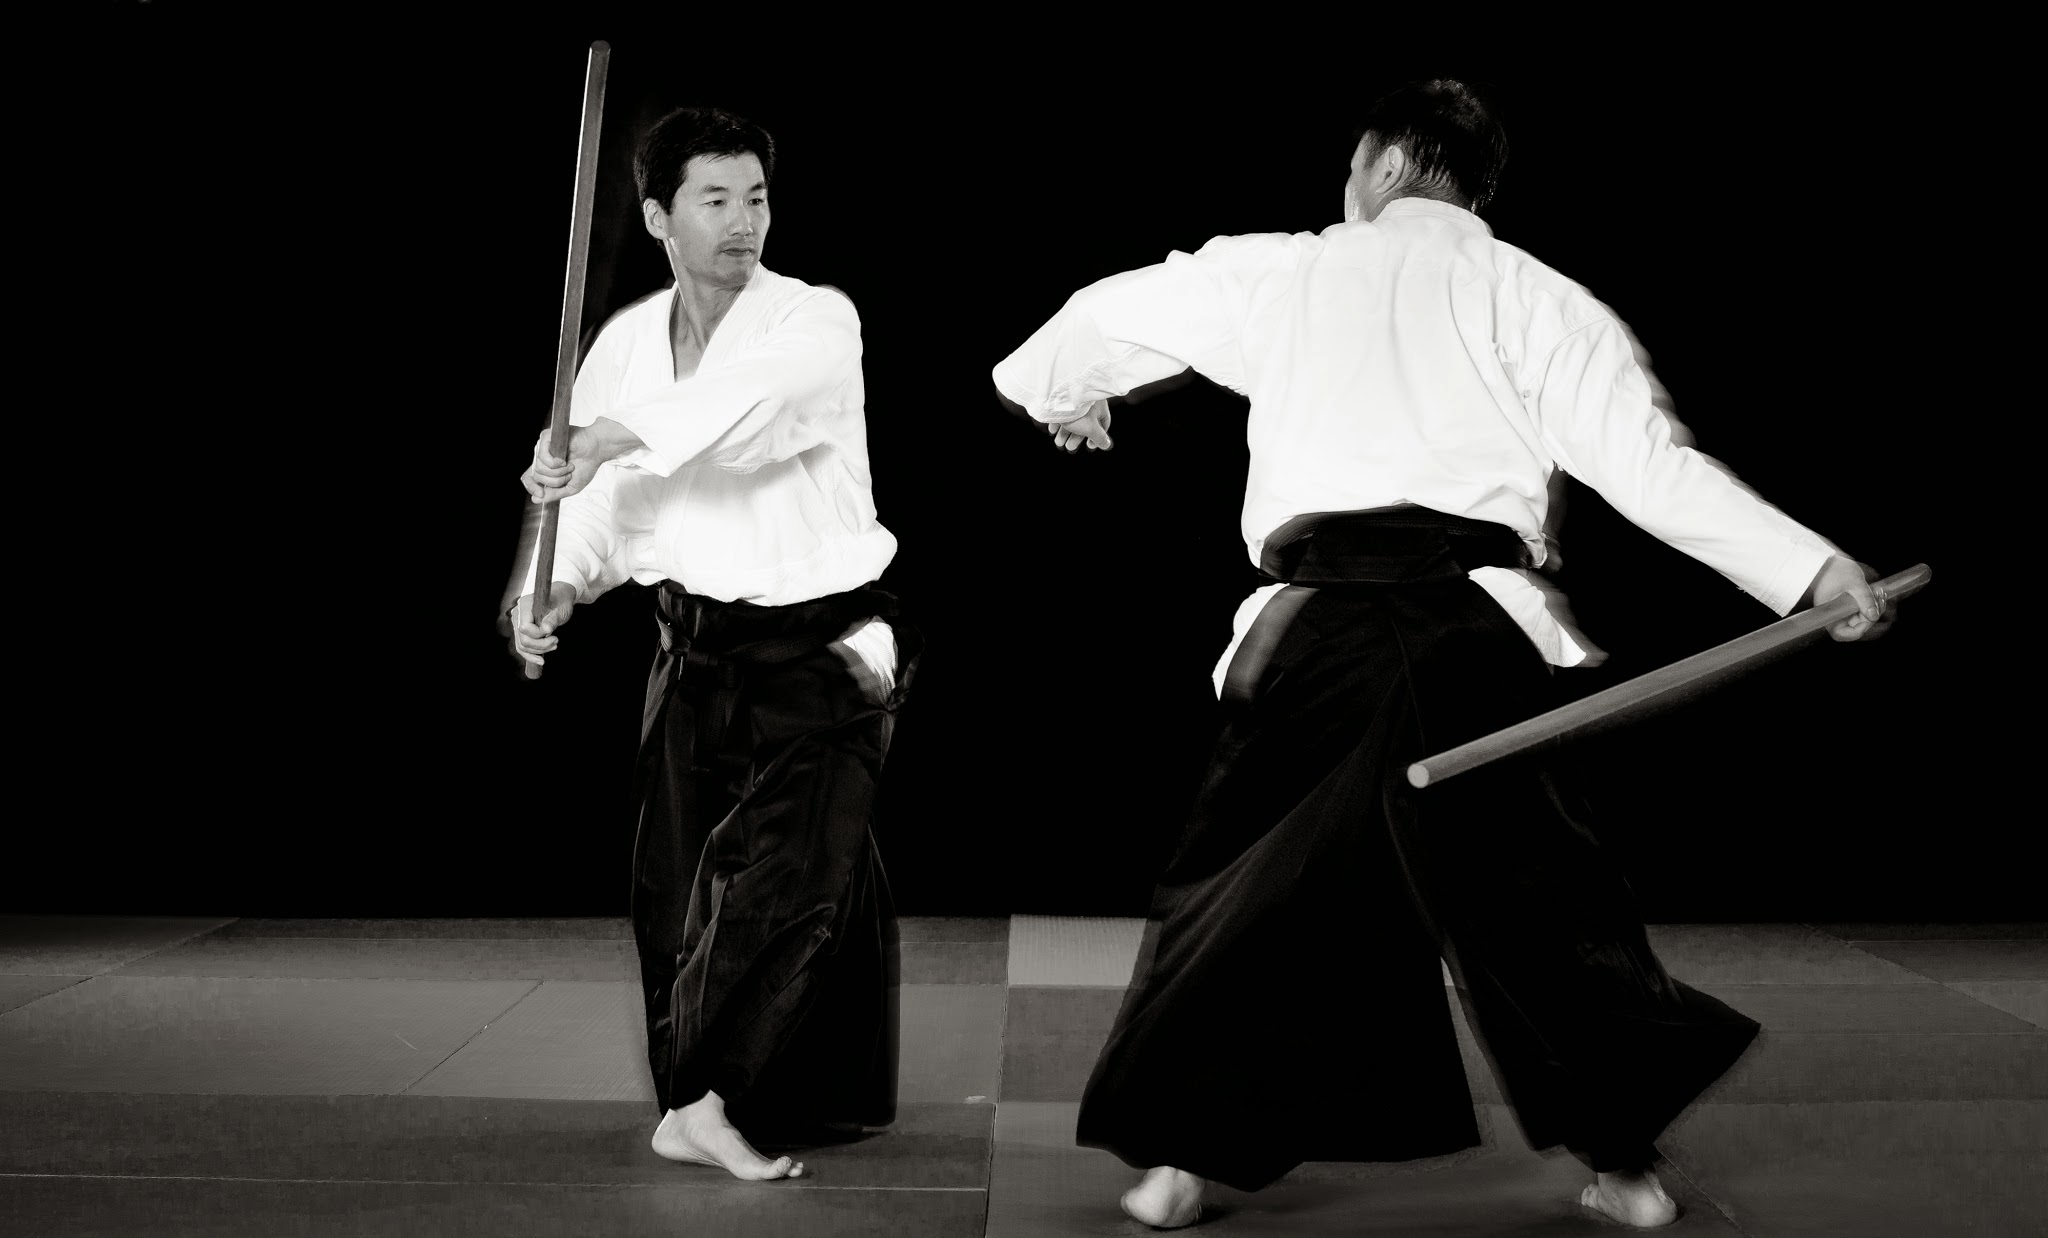 Aikido_Mar_2014-3554.jpg